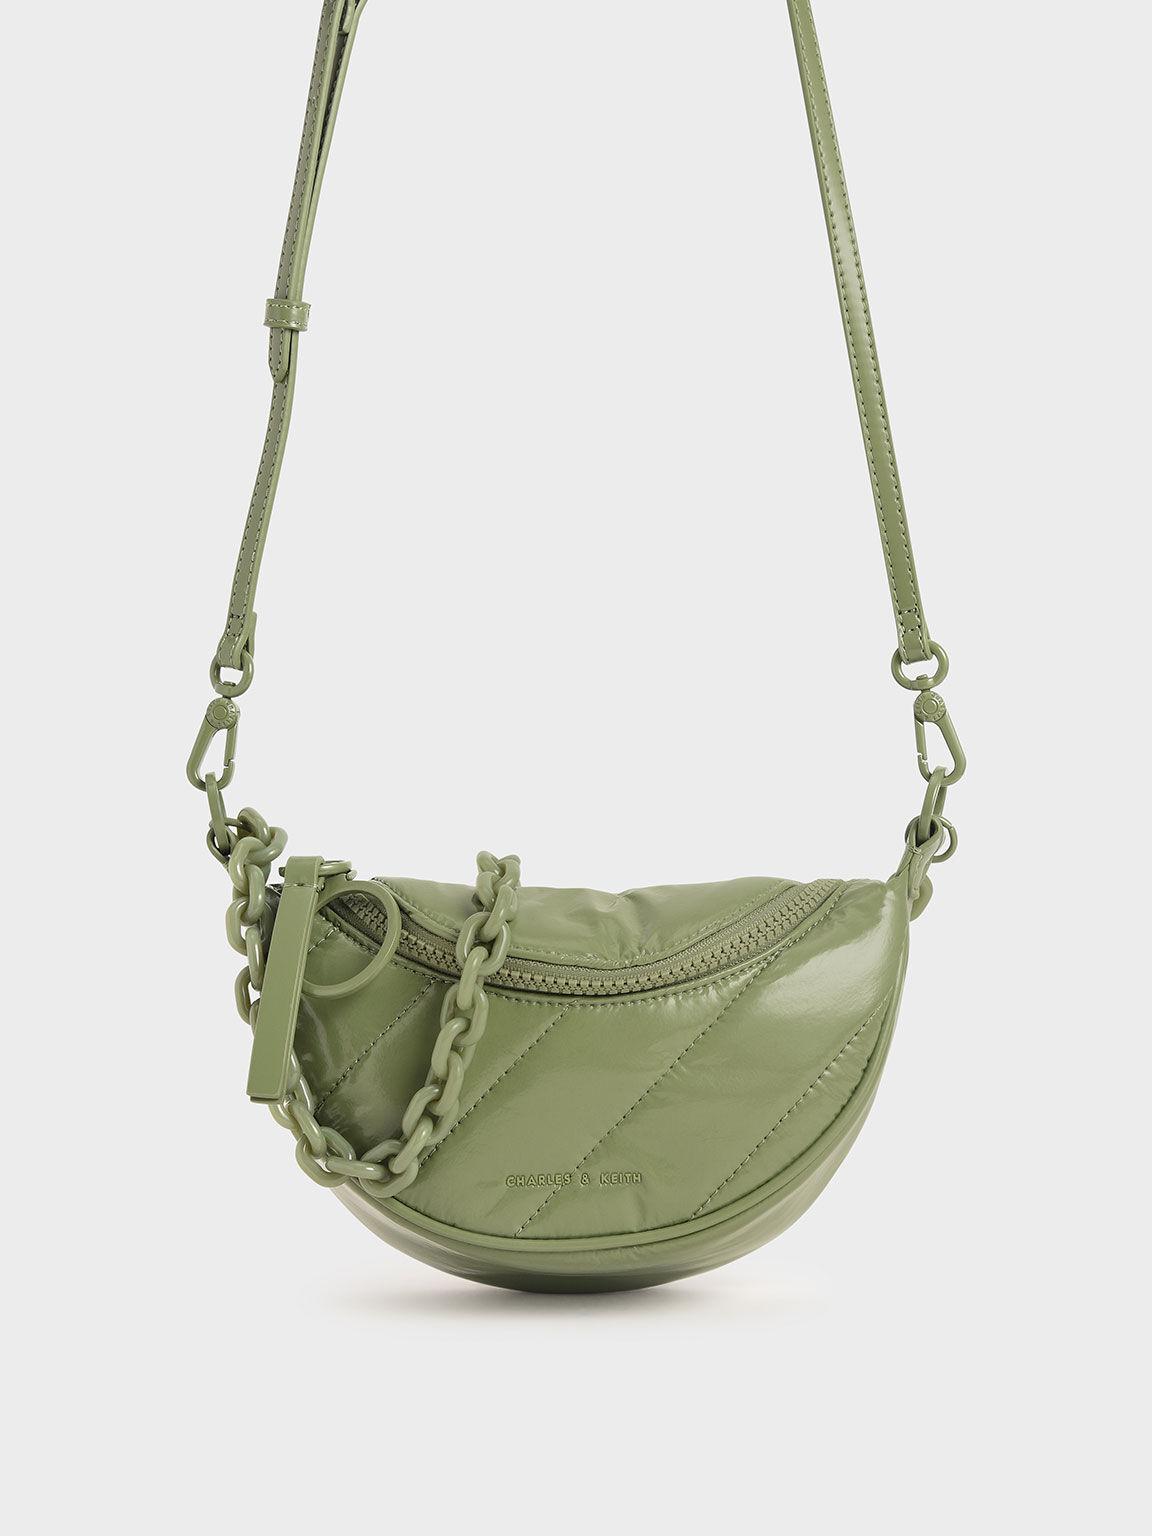 Patent Semi-Circle Crossbody Bag, Sage Green, hi-res